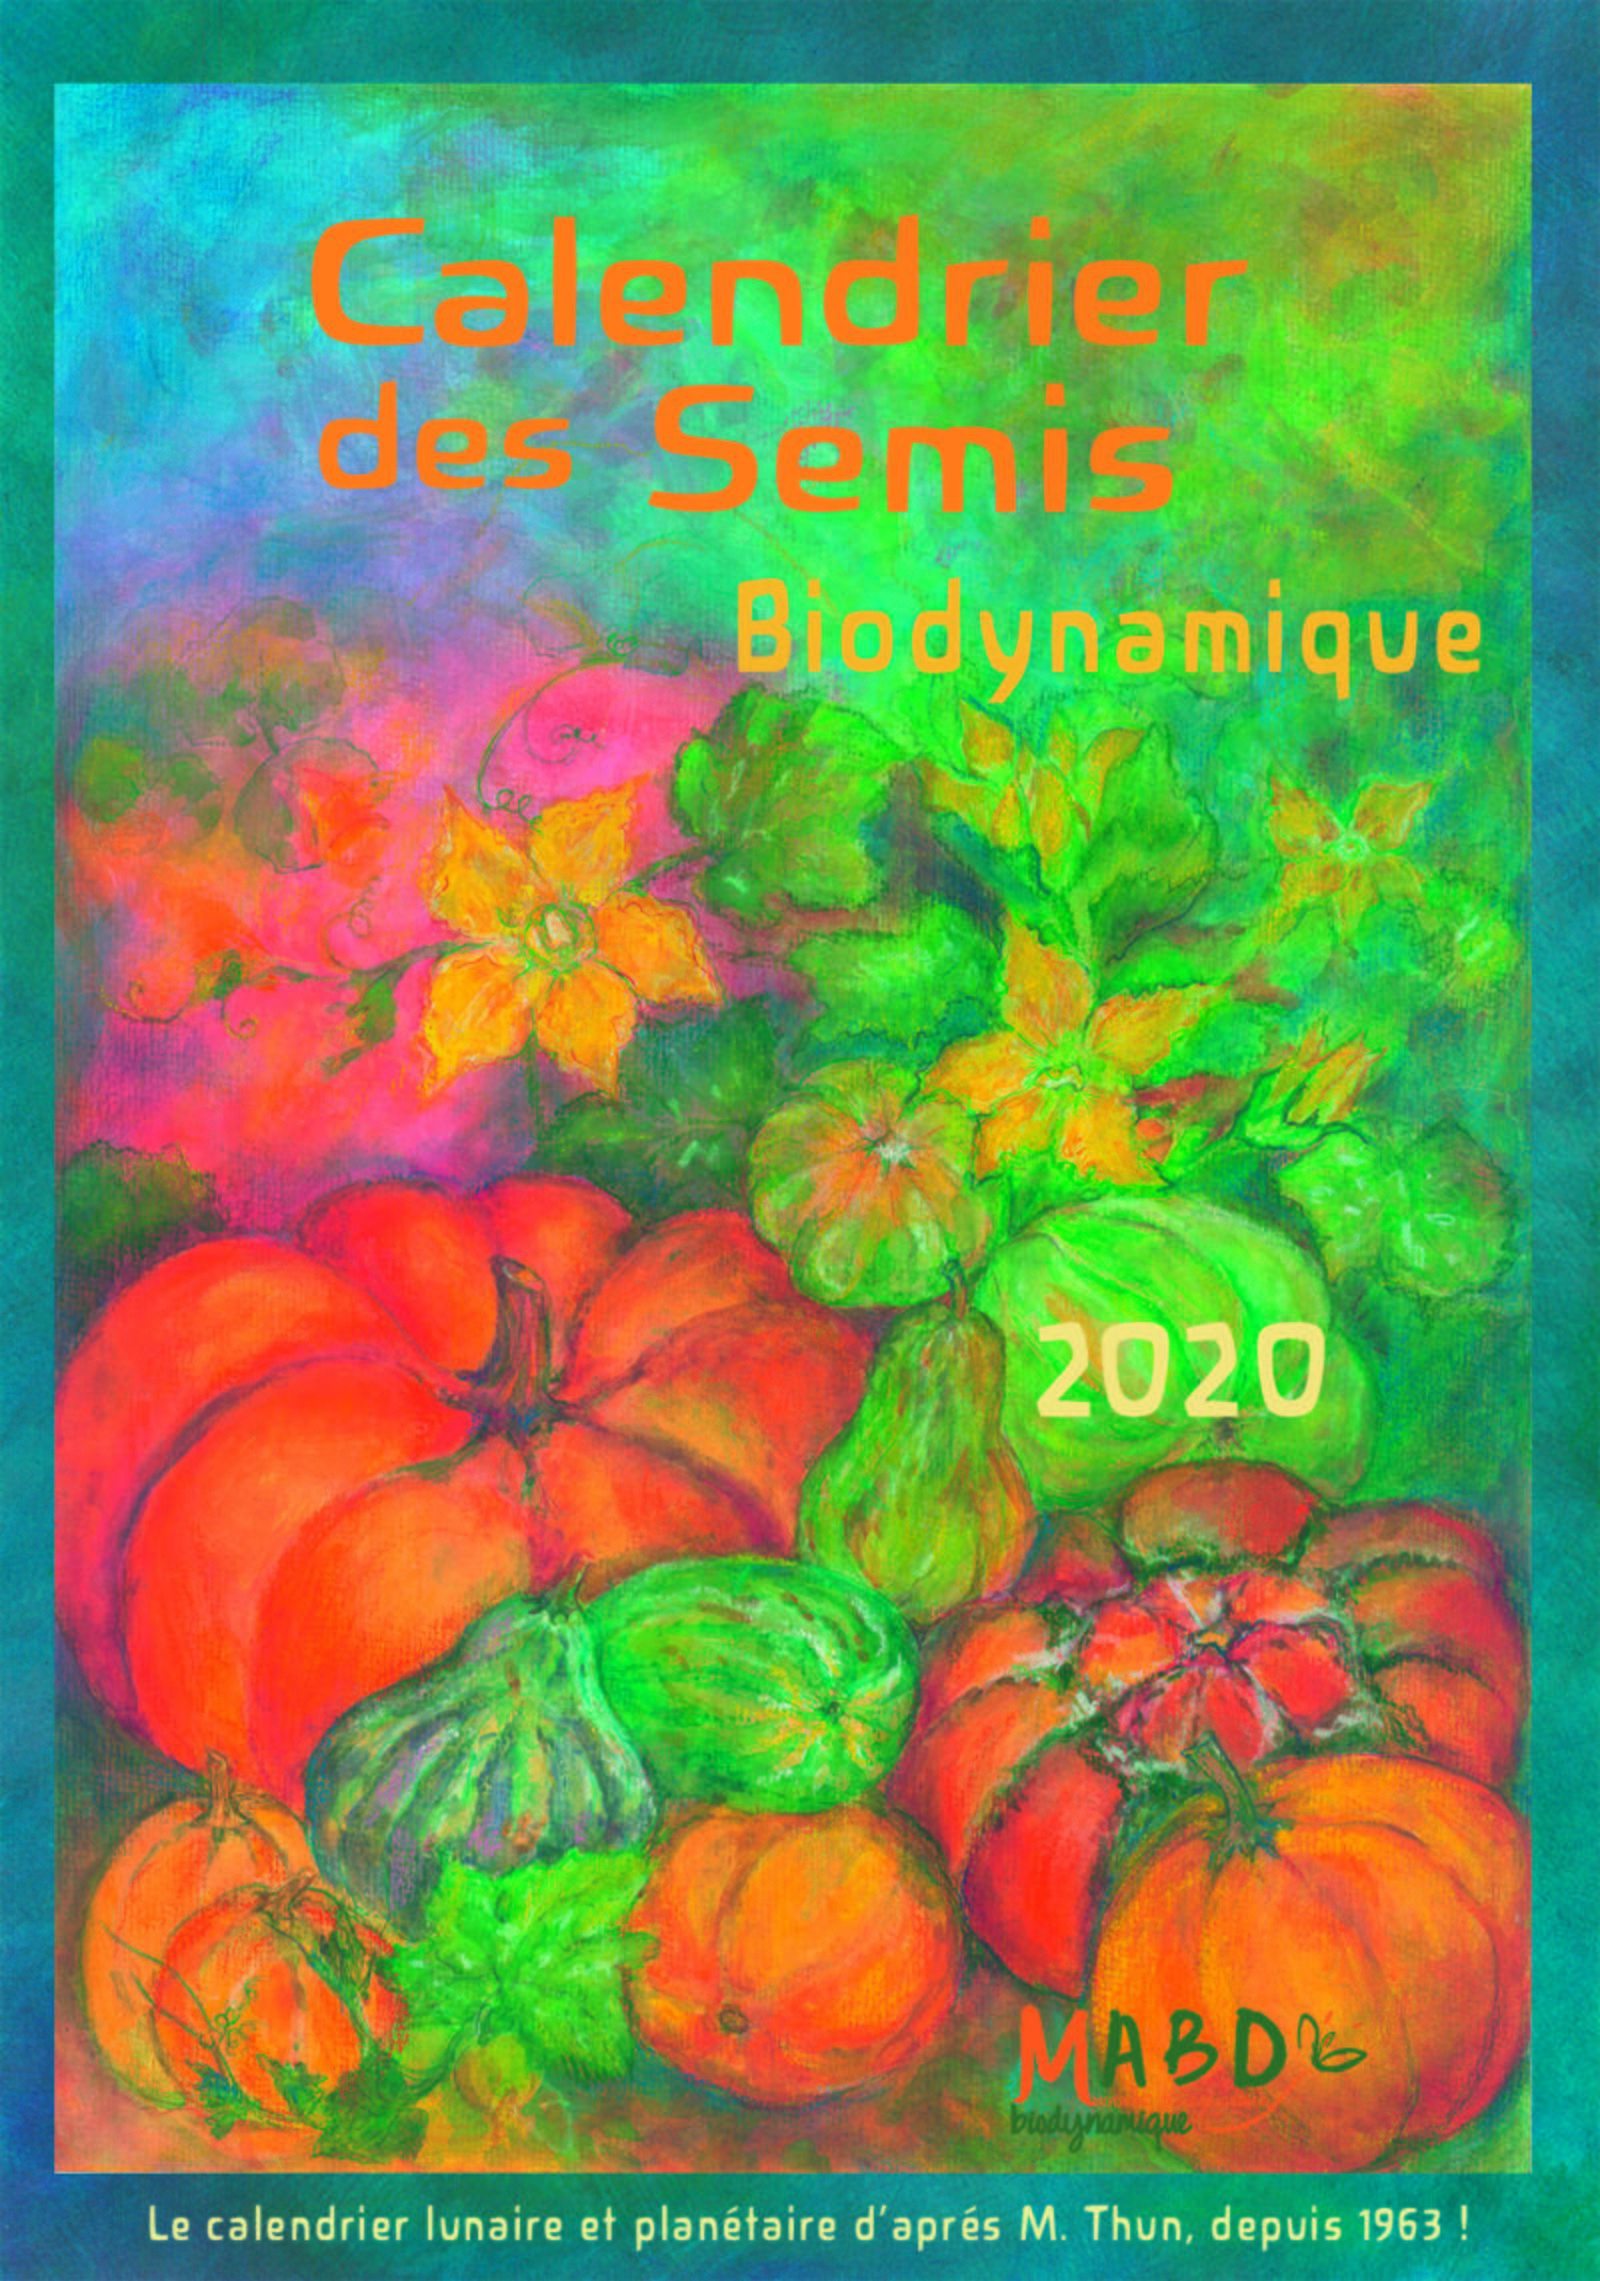 CALENDRIER DES SEMIS 2020 - BIODYNAMIQUE